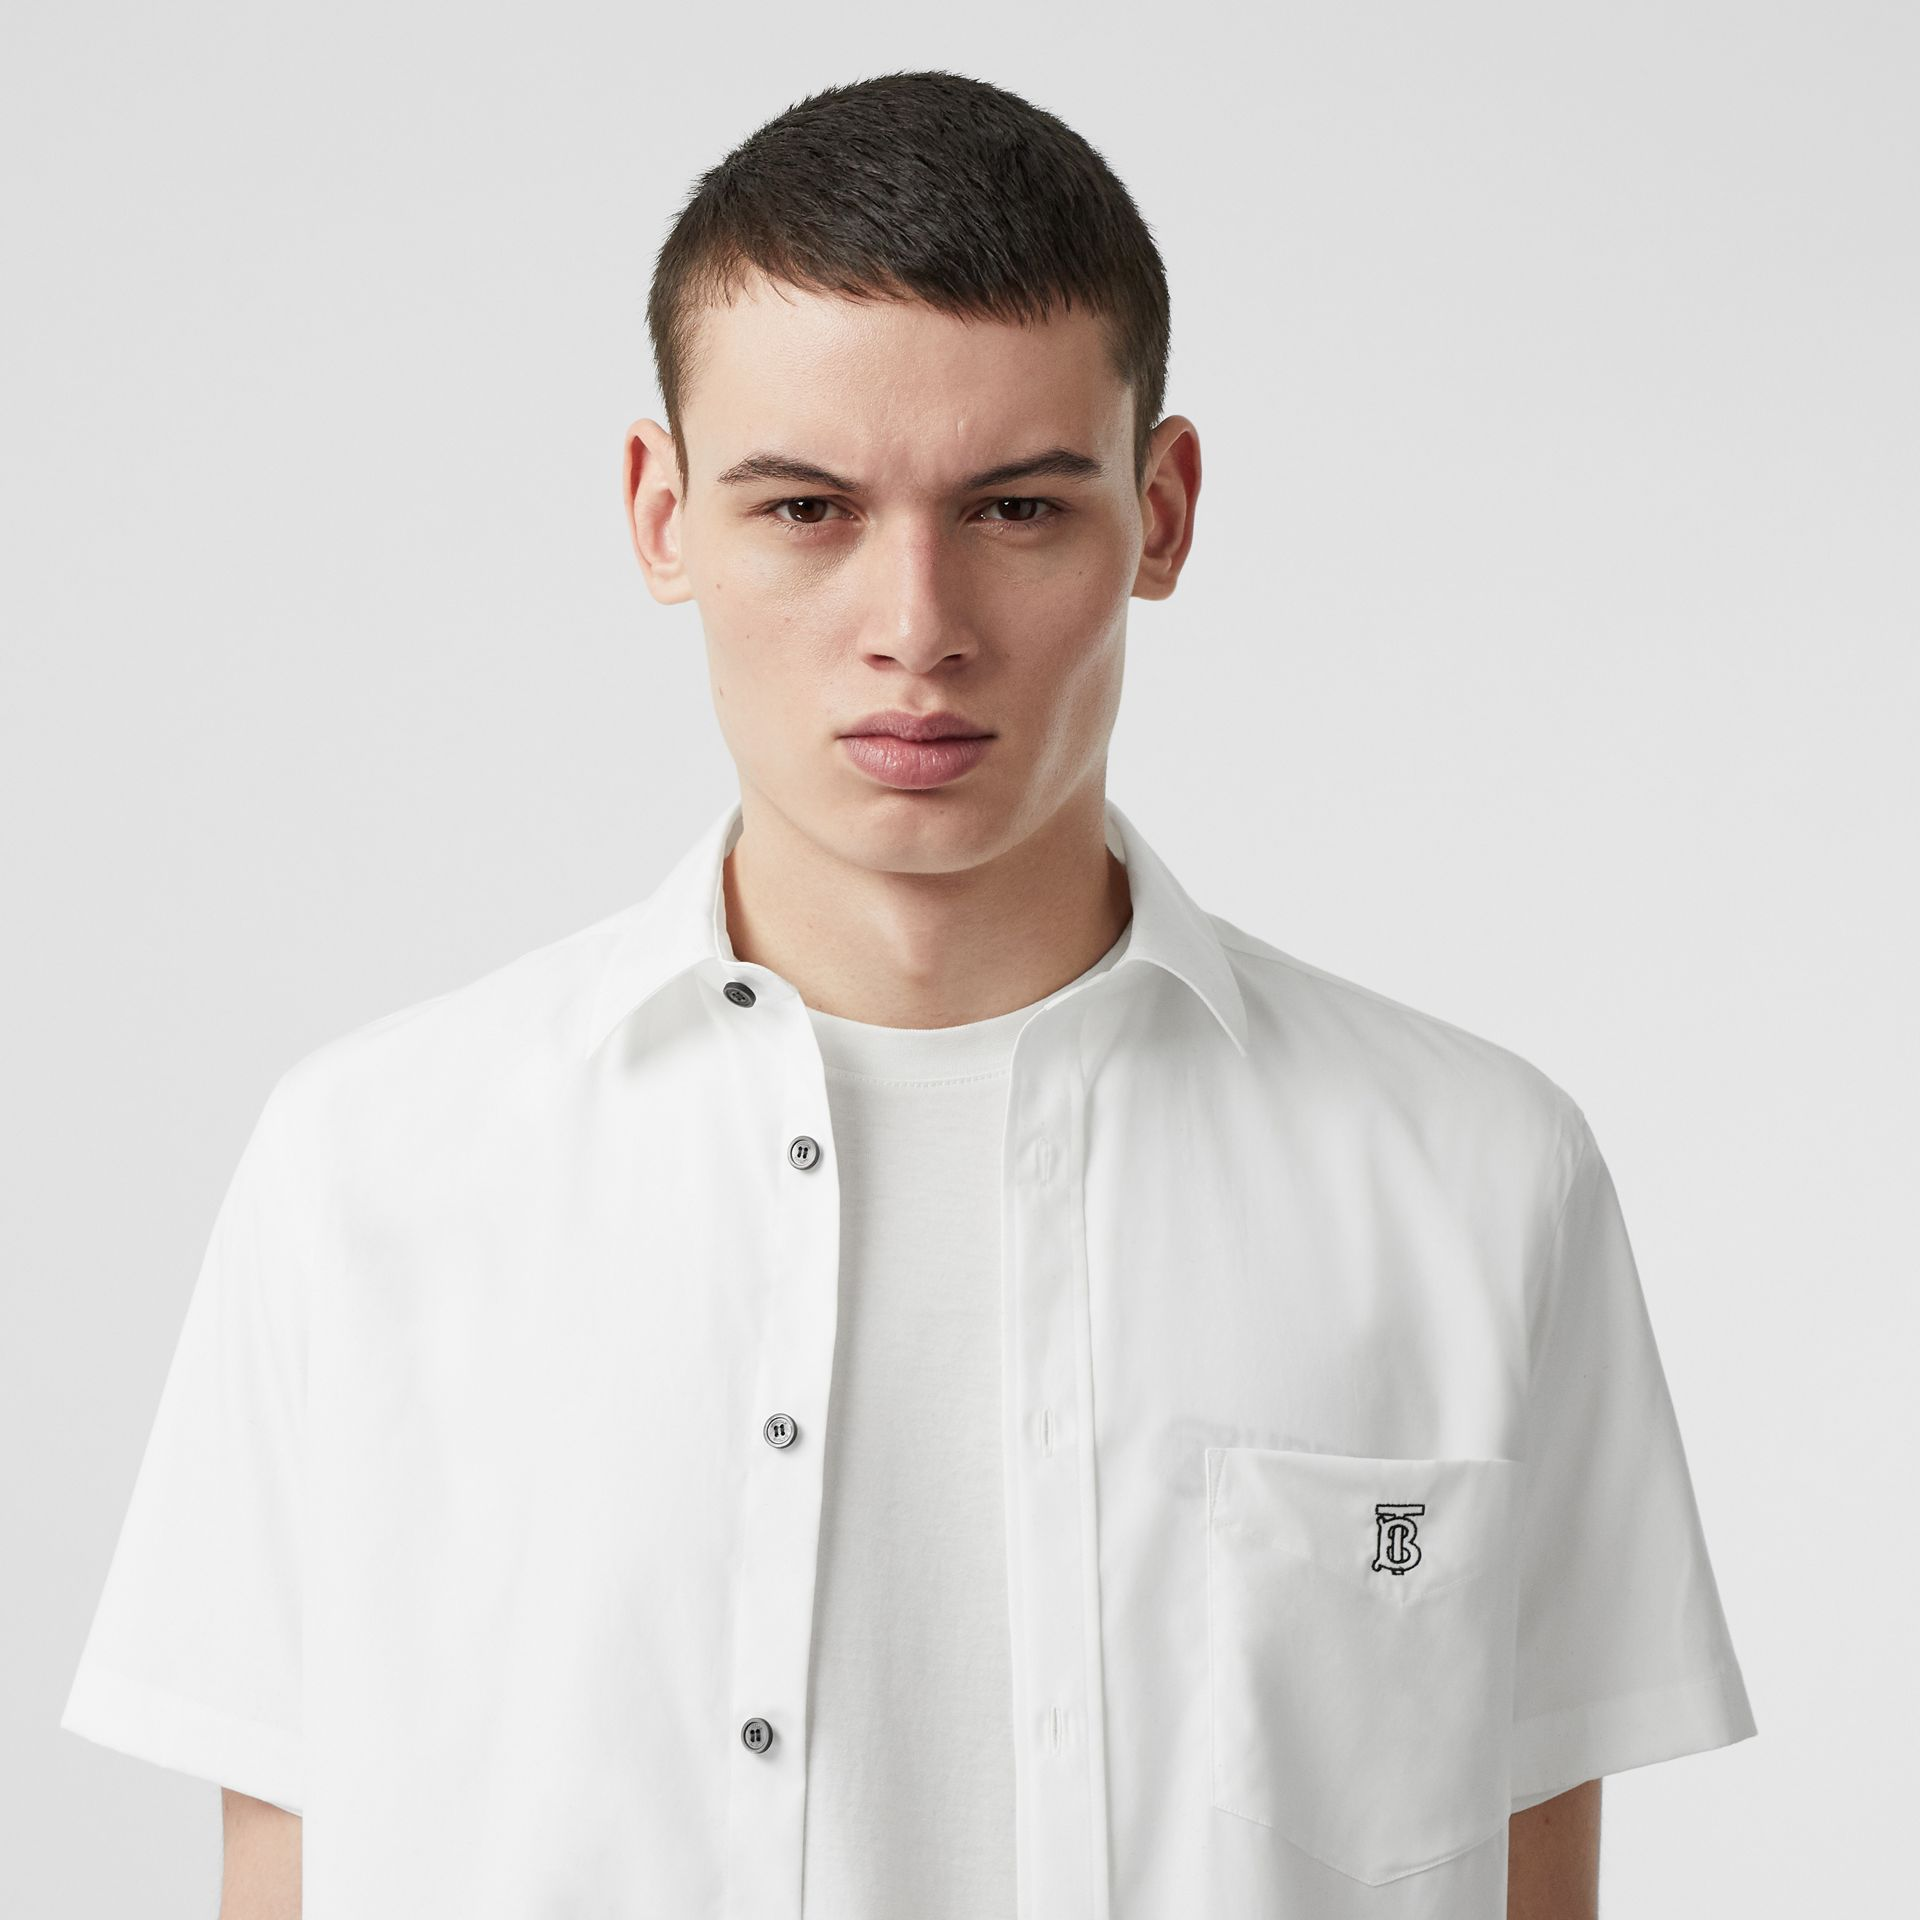 Monogram Motif Stretch Cotton Poplin Shirt in White - Men | Burberry - gallery image 1